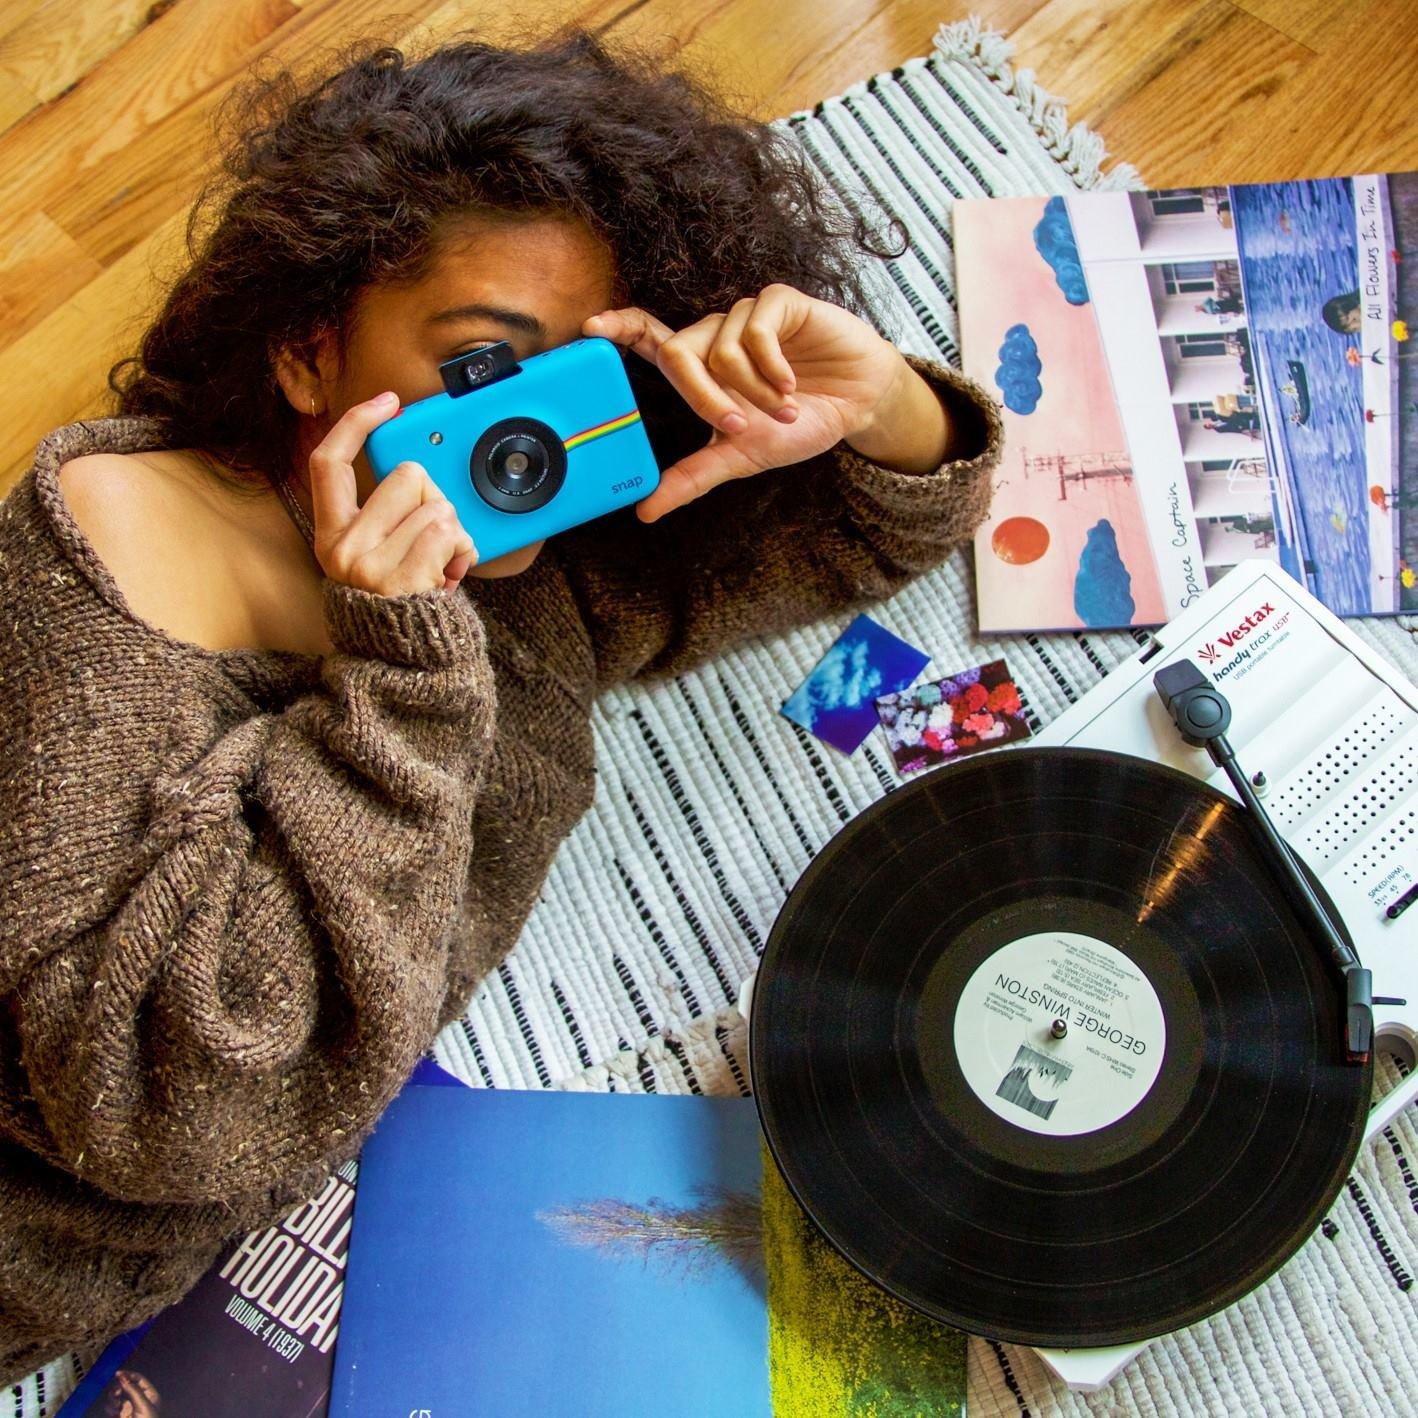 Blue Polaroid Snap Instant Digital Camera with Polaroid 2x3ʺ Premium ZINK Zero Photo Paper 50-Pack